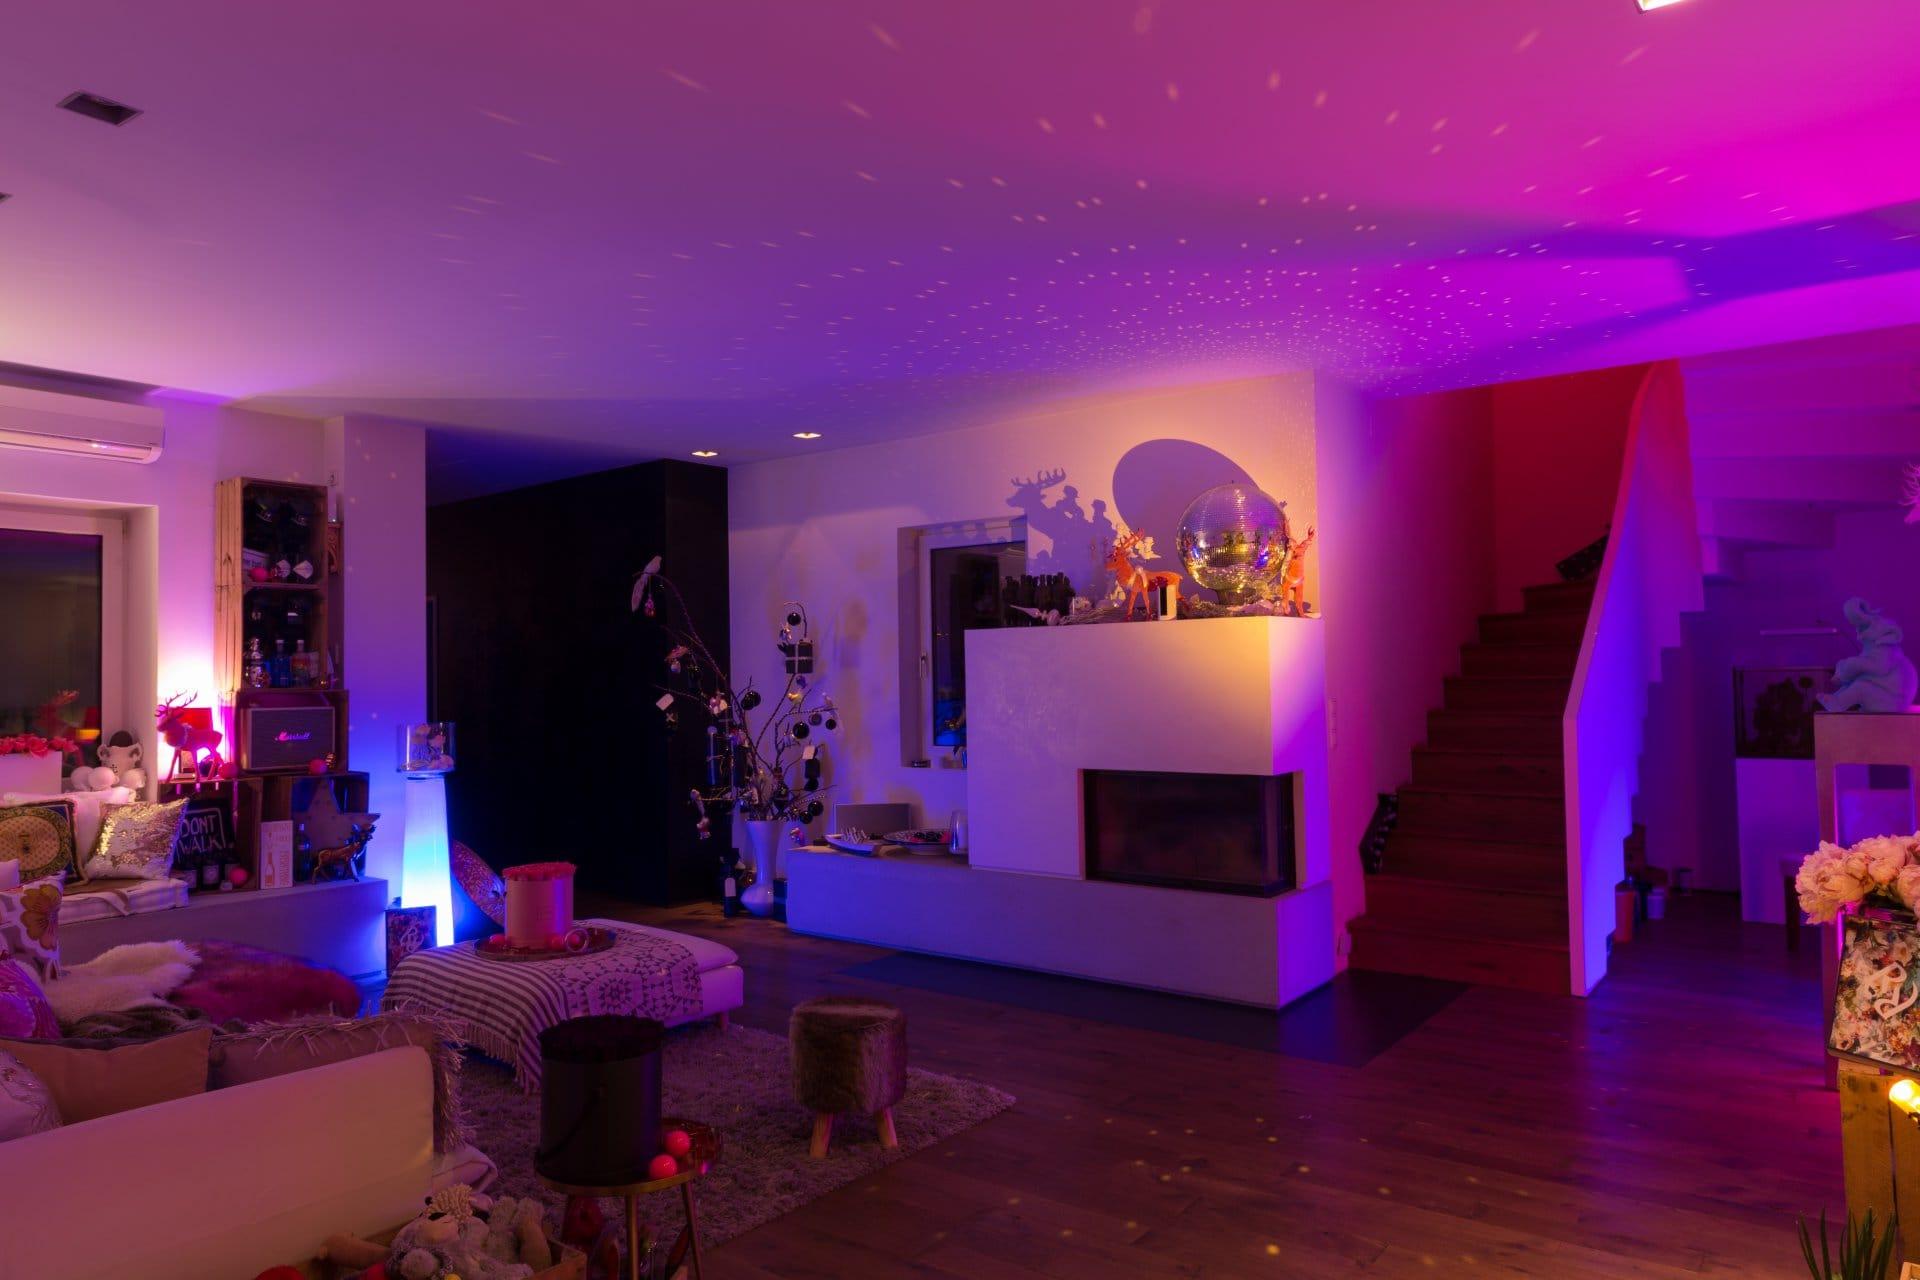 2017 12 09 homedecorations 6